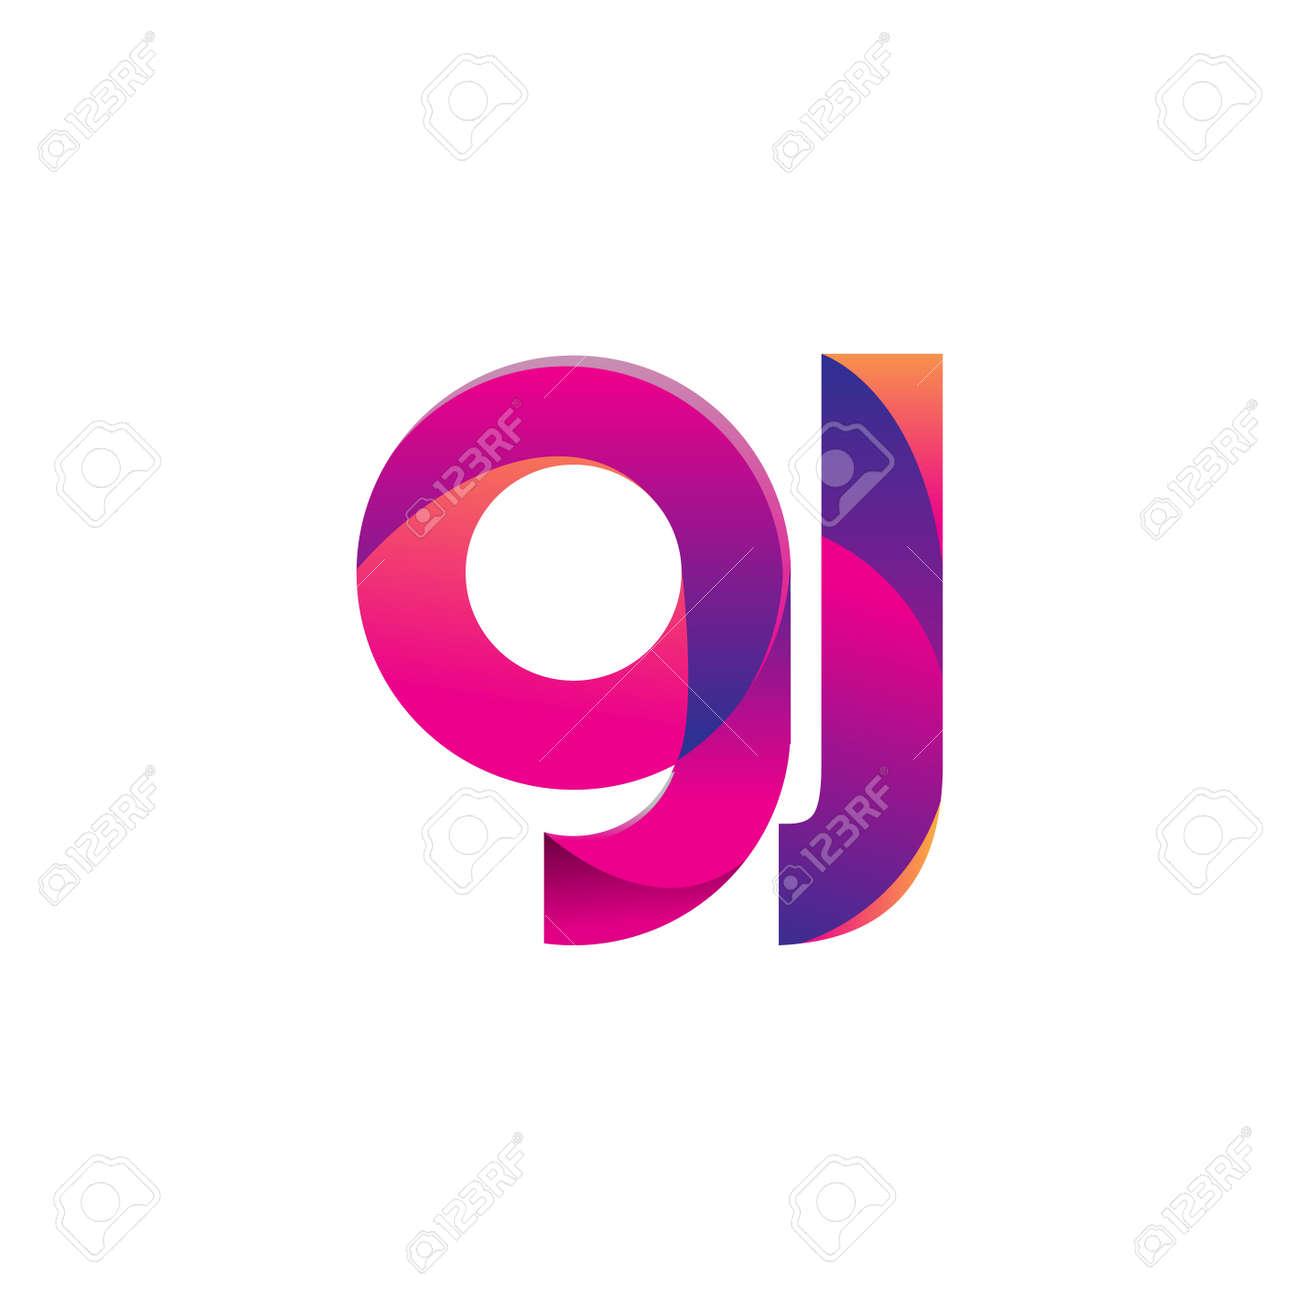 Initial Letter GJ Logo Lowercase, magenta and orange, Modern and Simple Logo Design. - 158294827